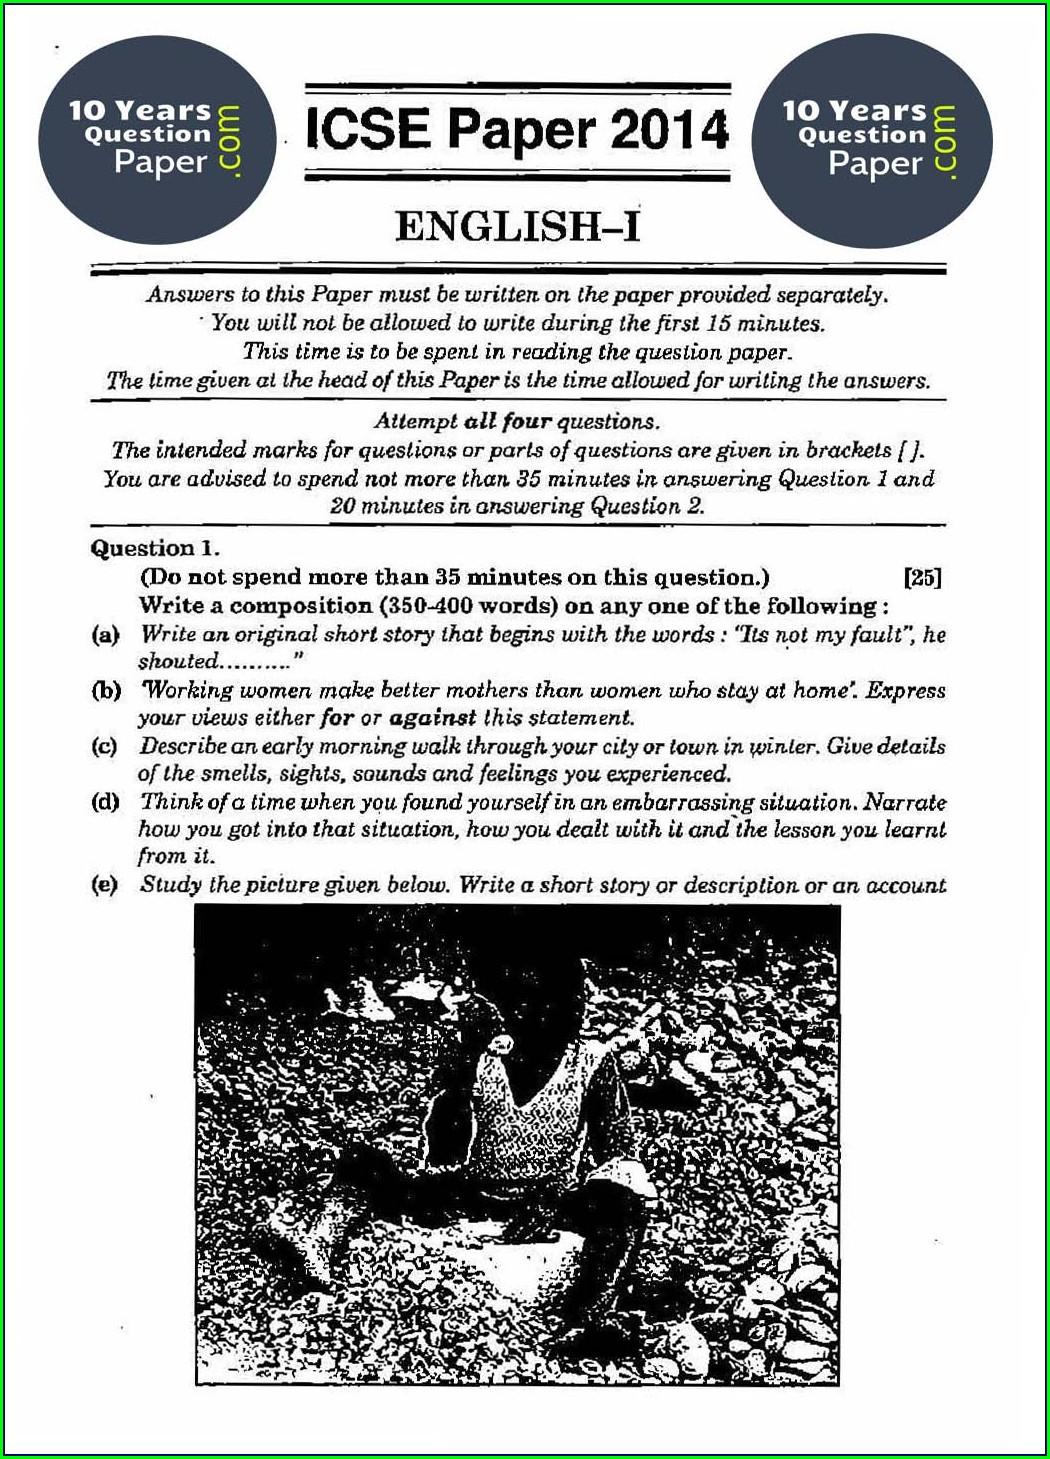 Cbse Class 6 English Grammar Worksheet Printable Worksheets And Activities For Teachers Parents Tutors And Homeschool Families